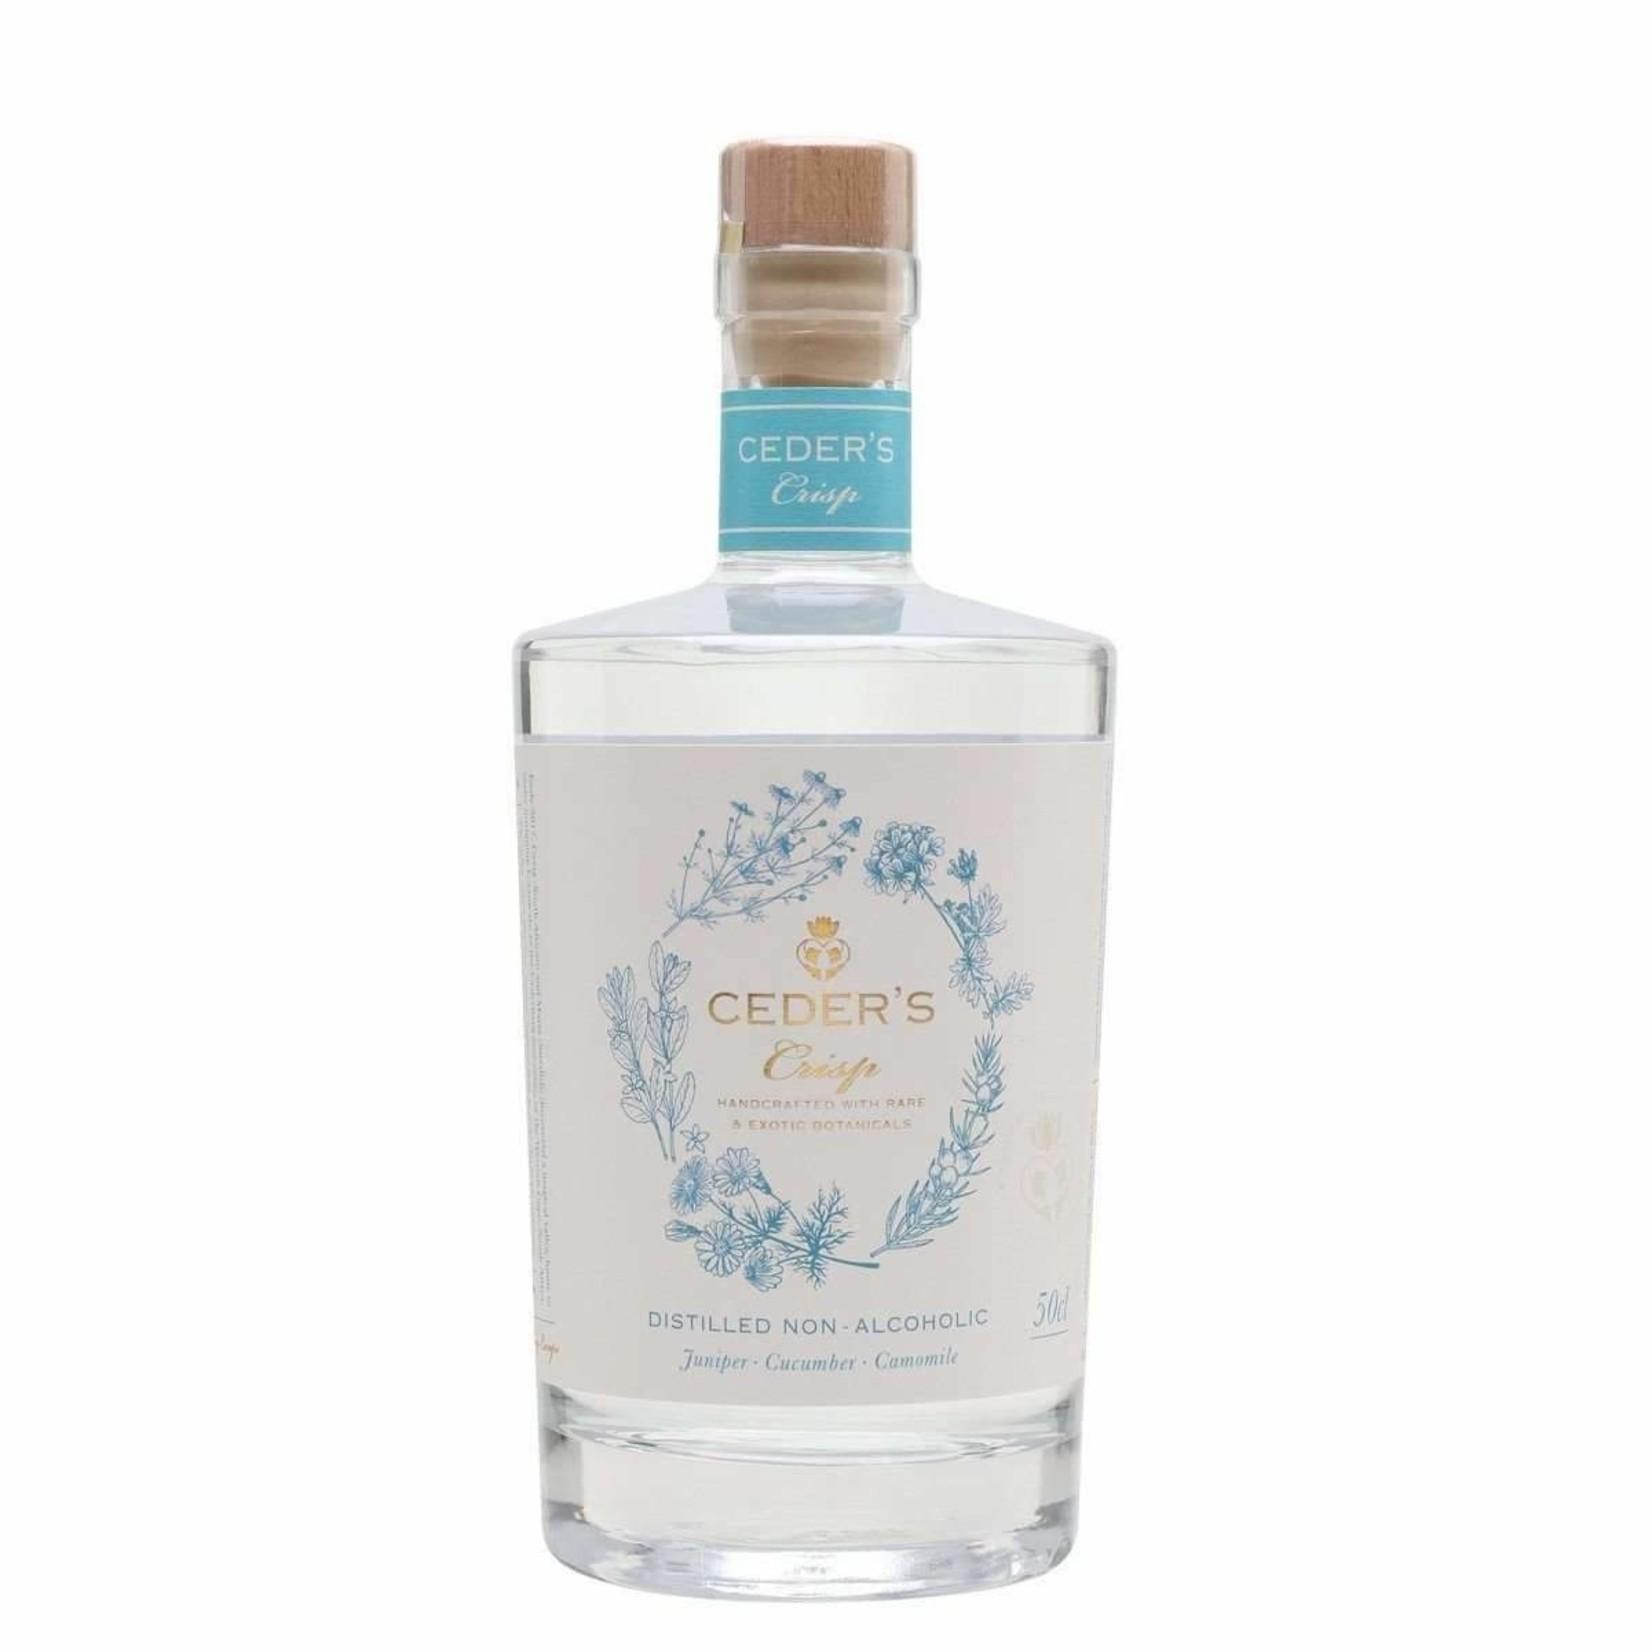 Ceder's Distilled Non- Alcoholic Spirit - Crisp